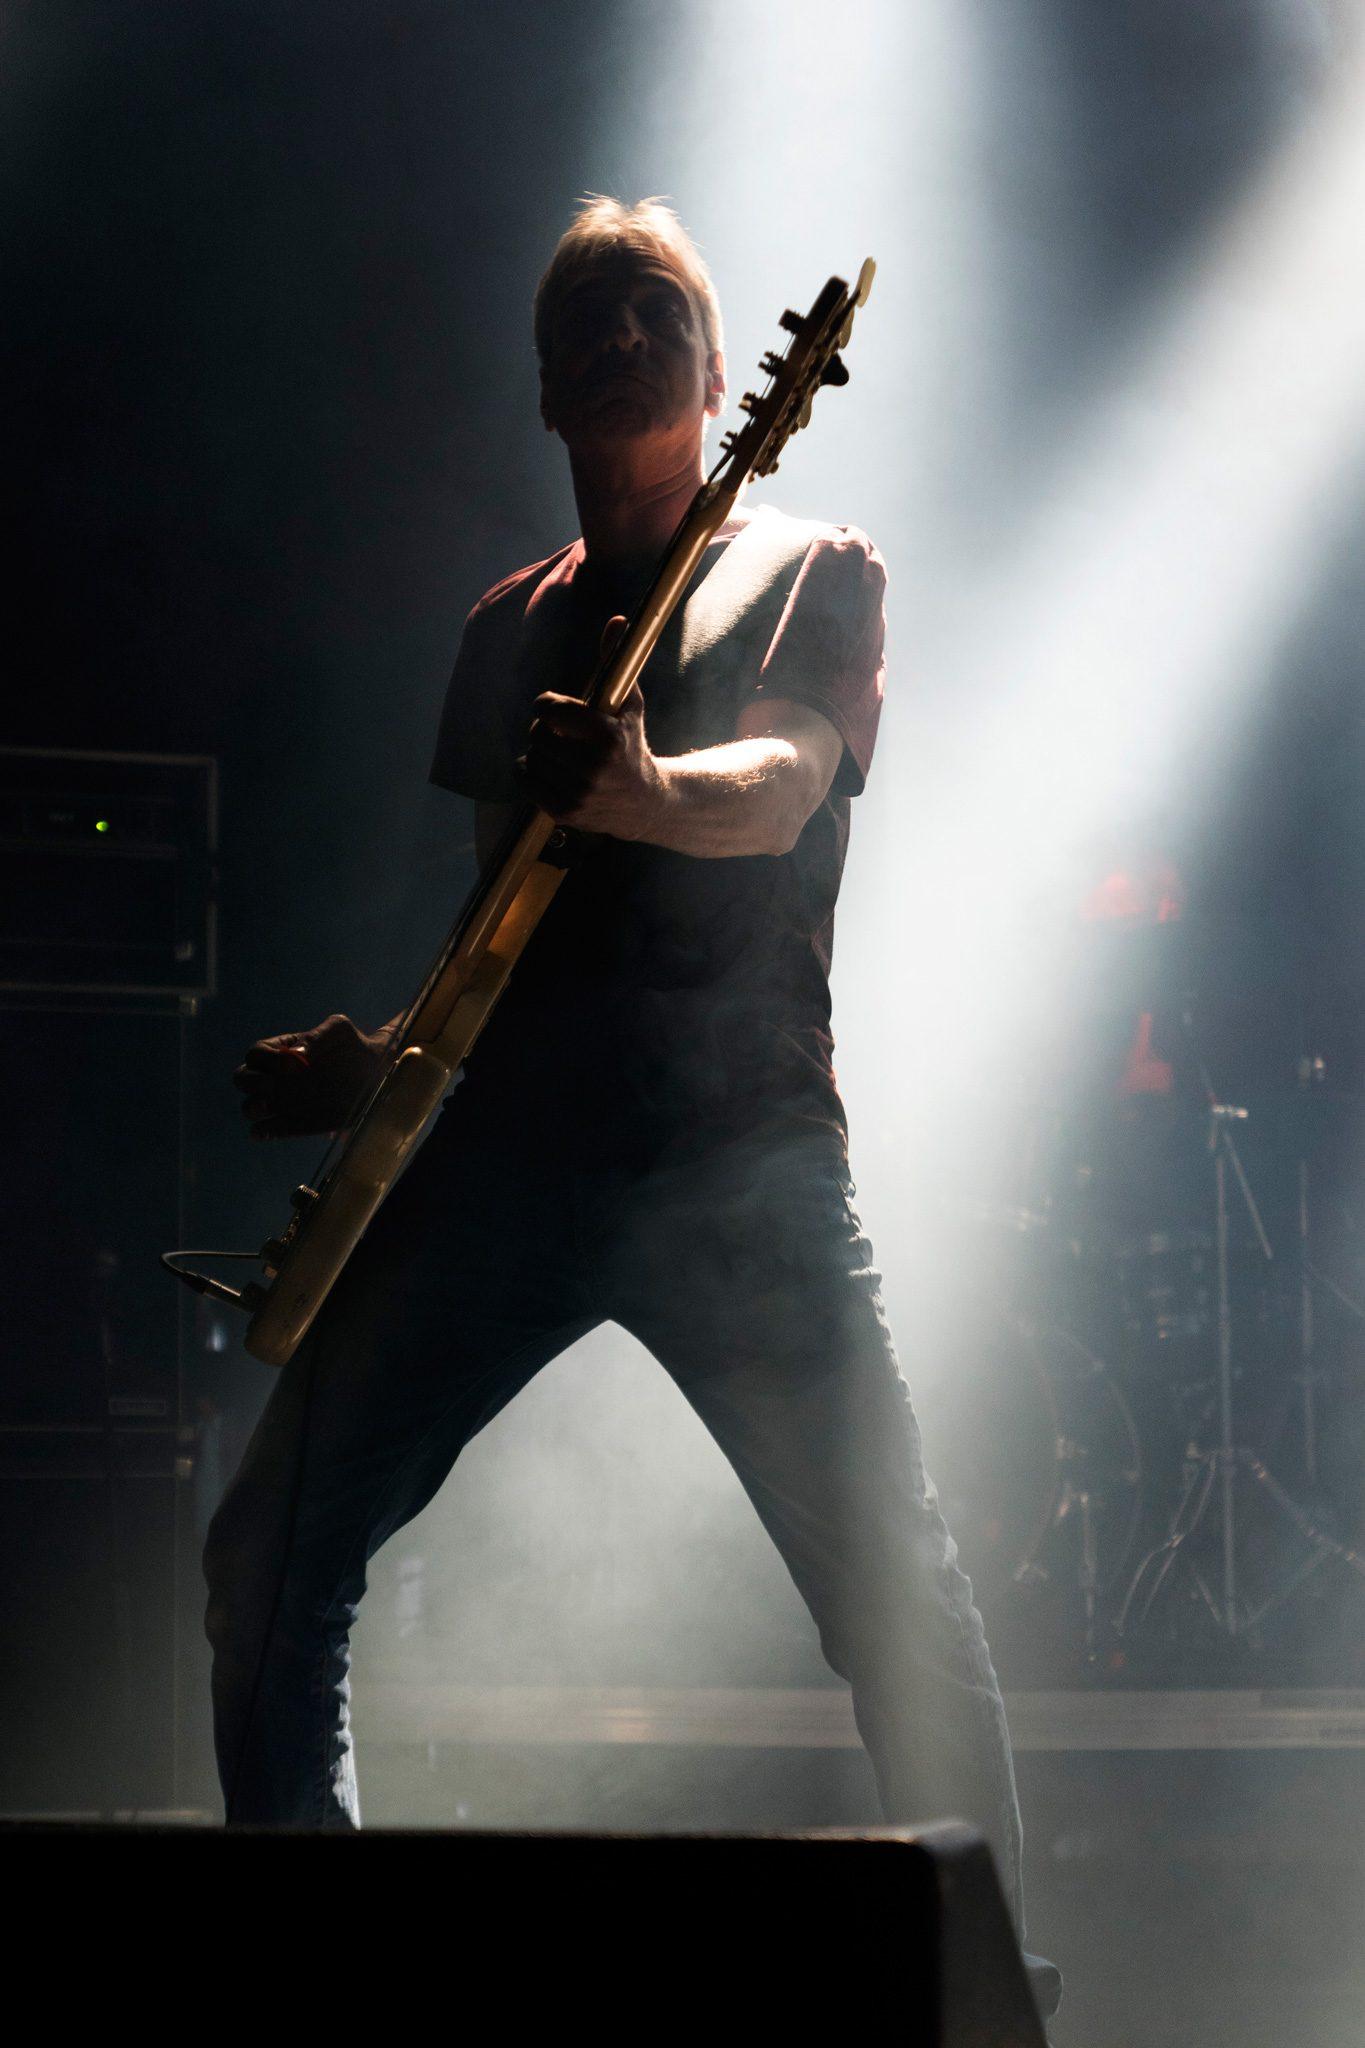 Livio Gustav Aiello, Raga Rockers